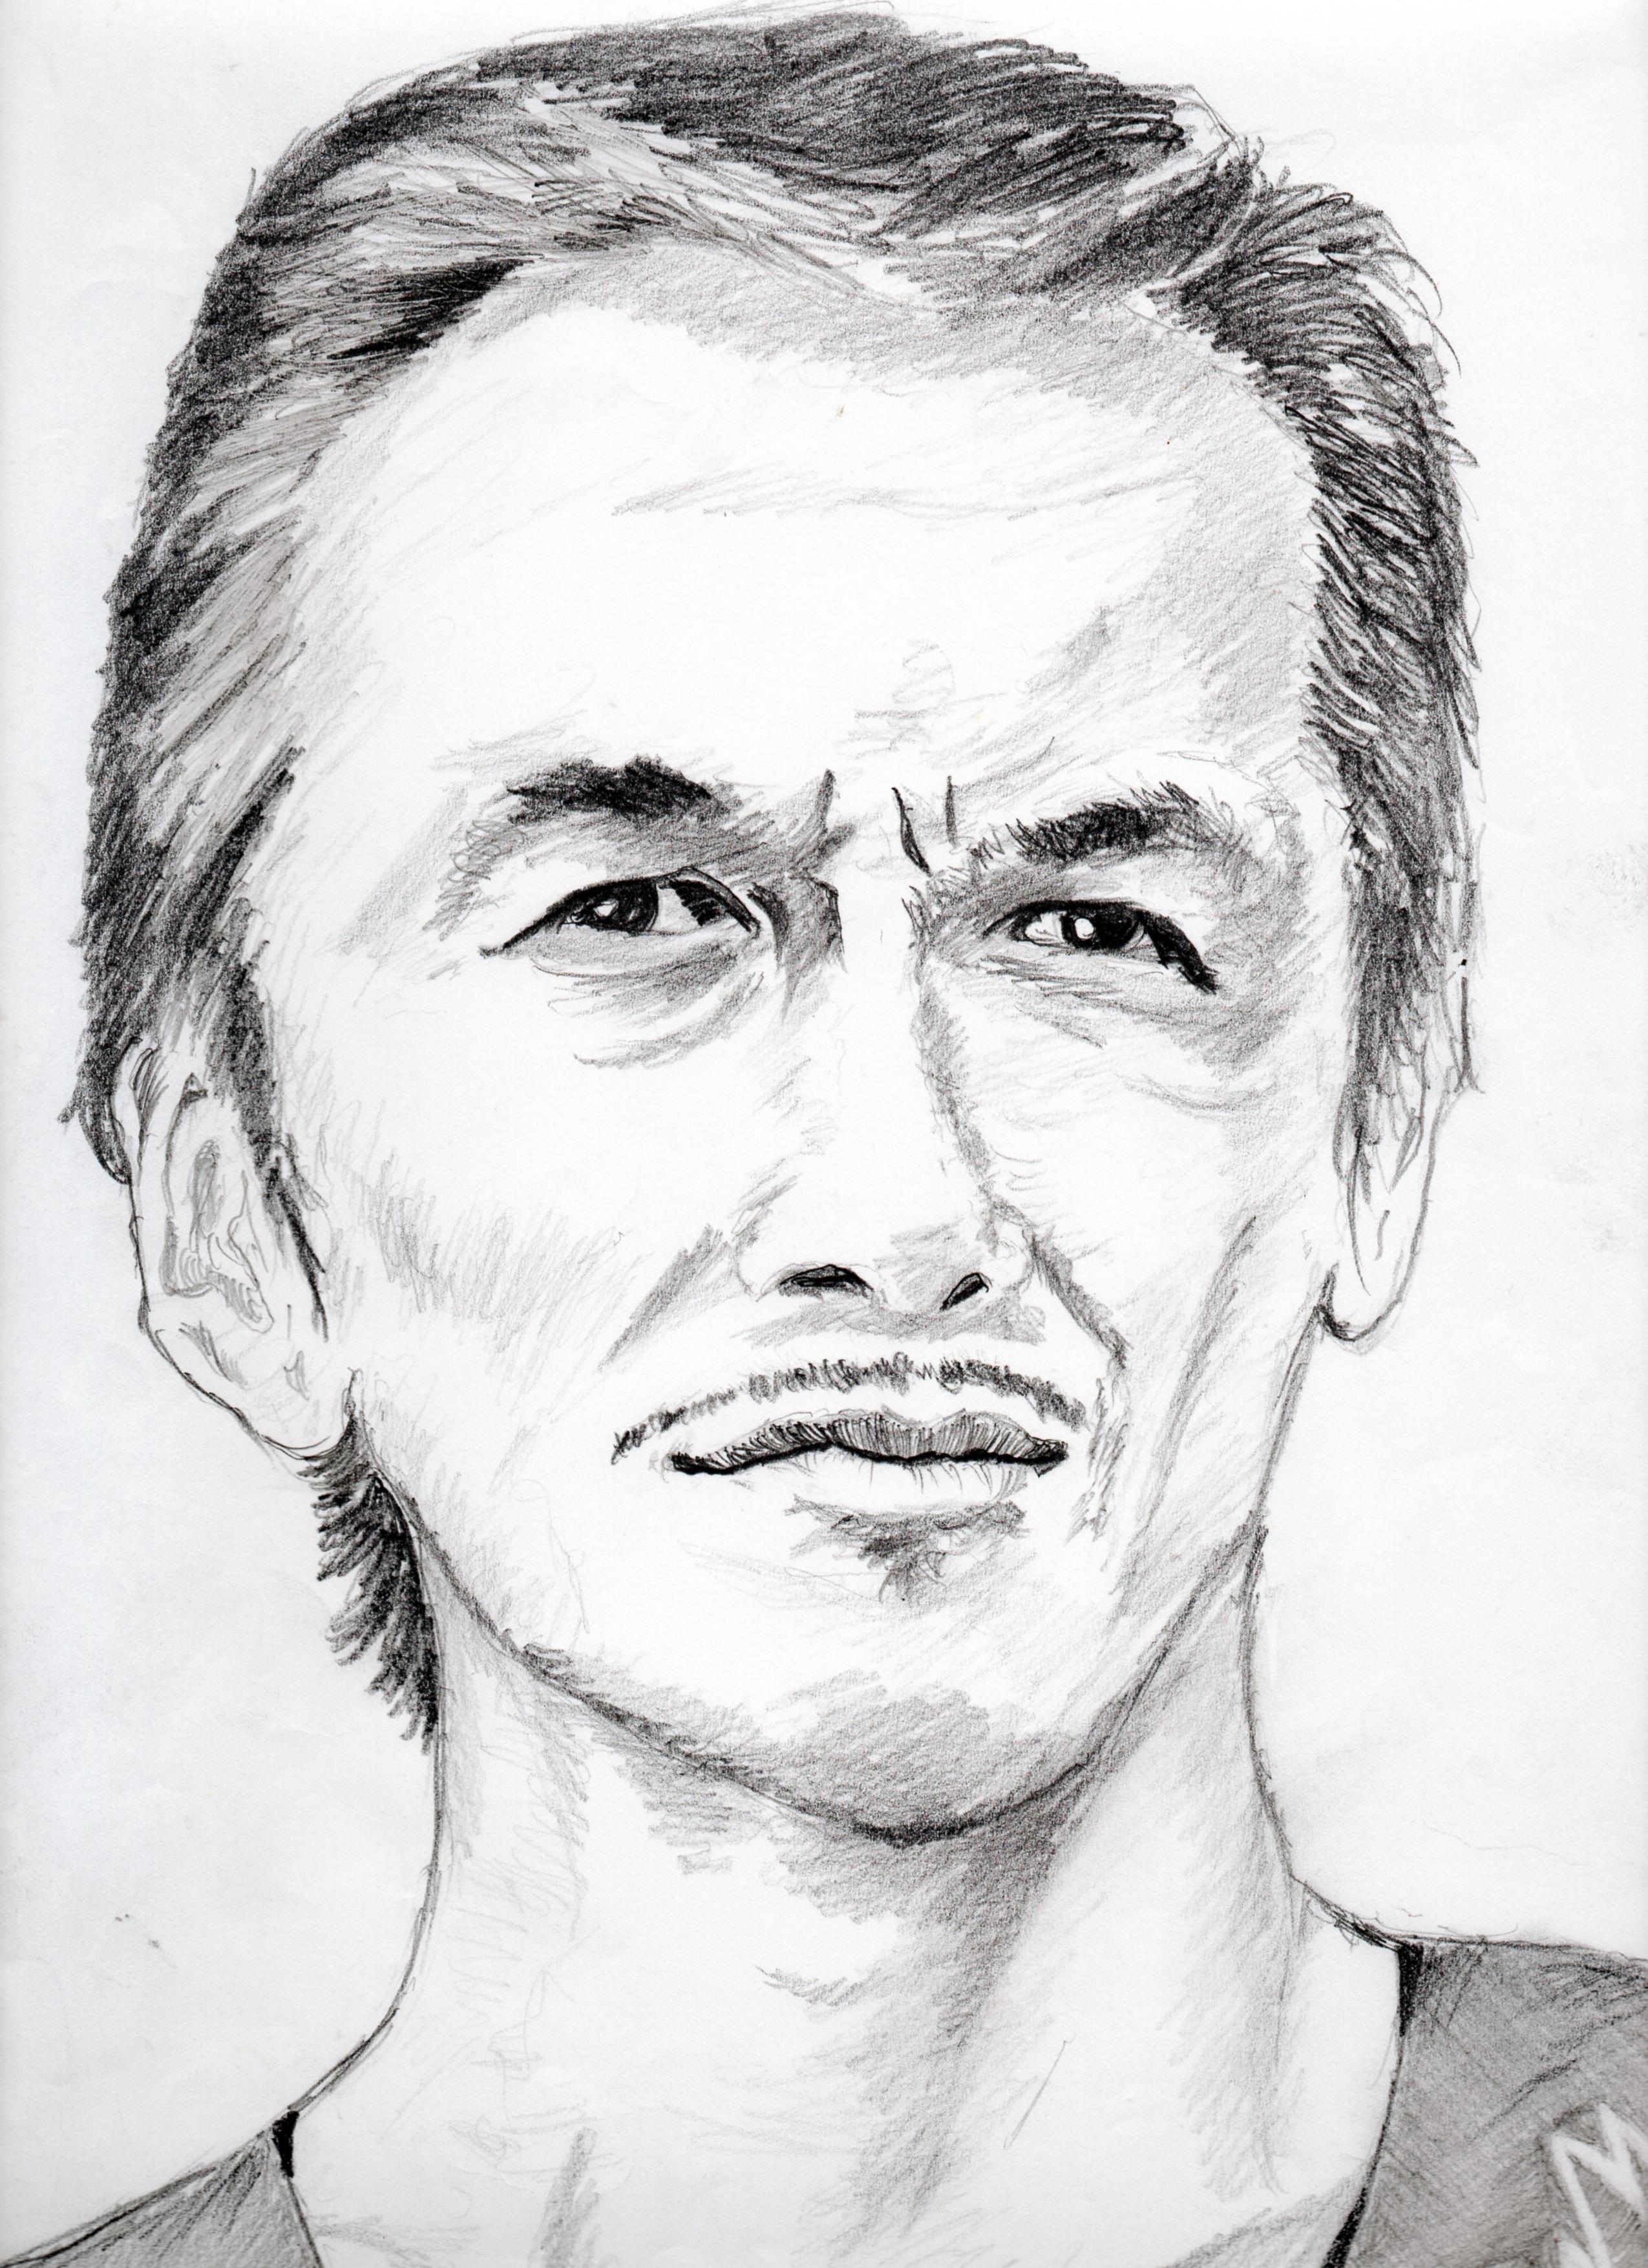 i寺島進の鉛筆画似顔絵